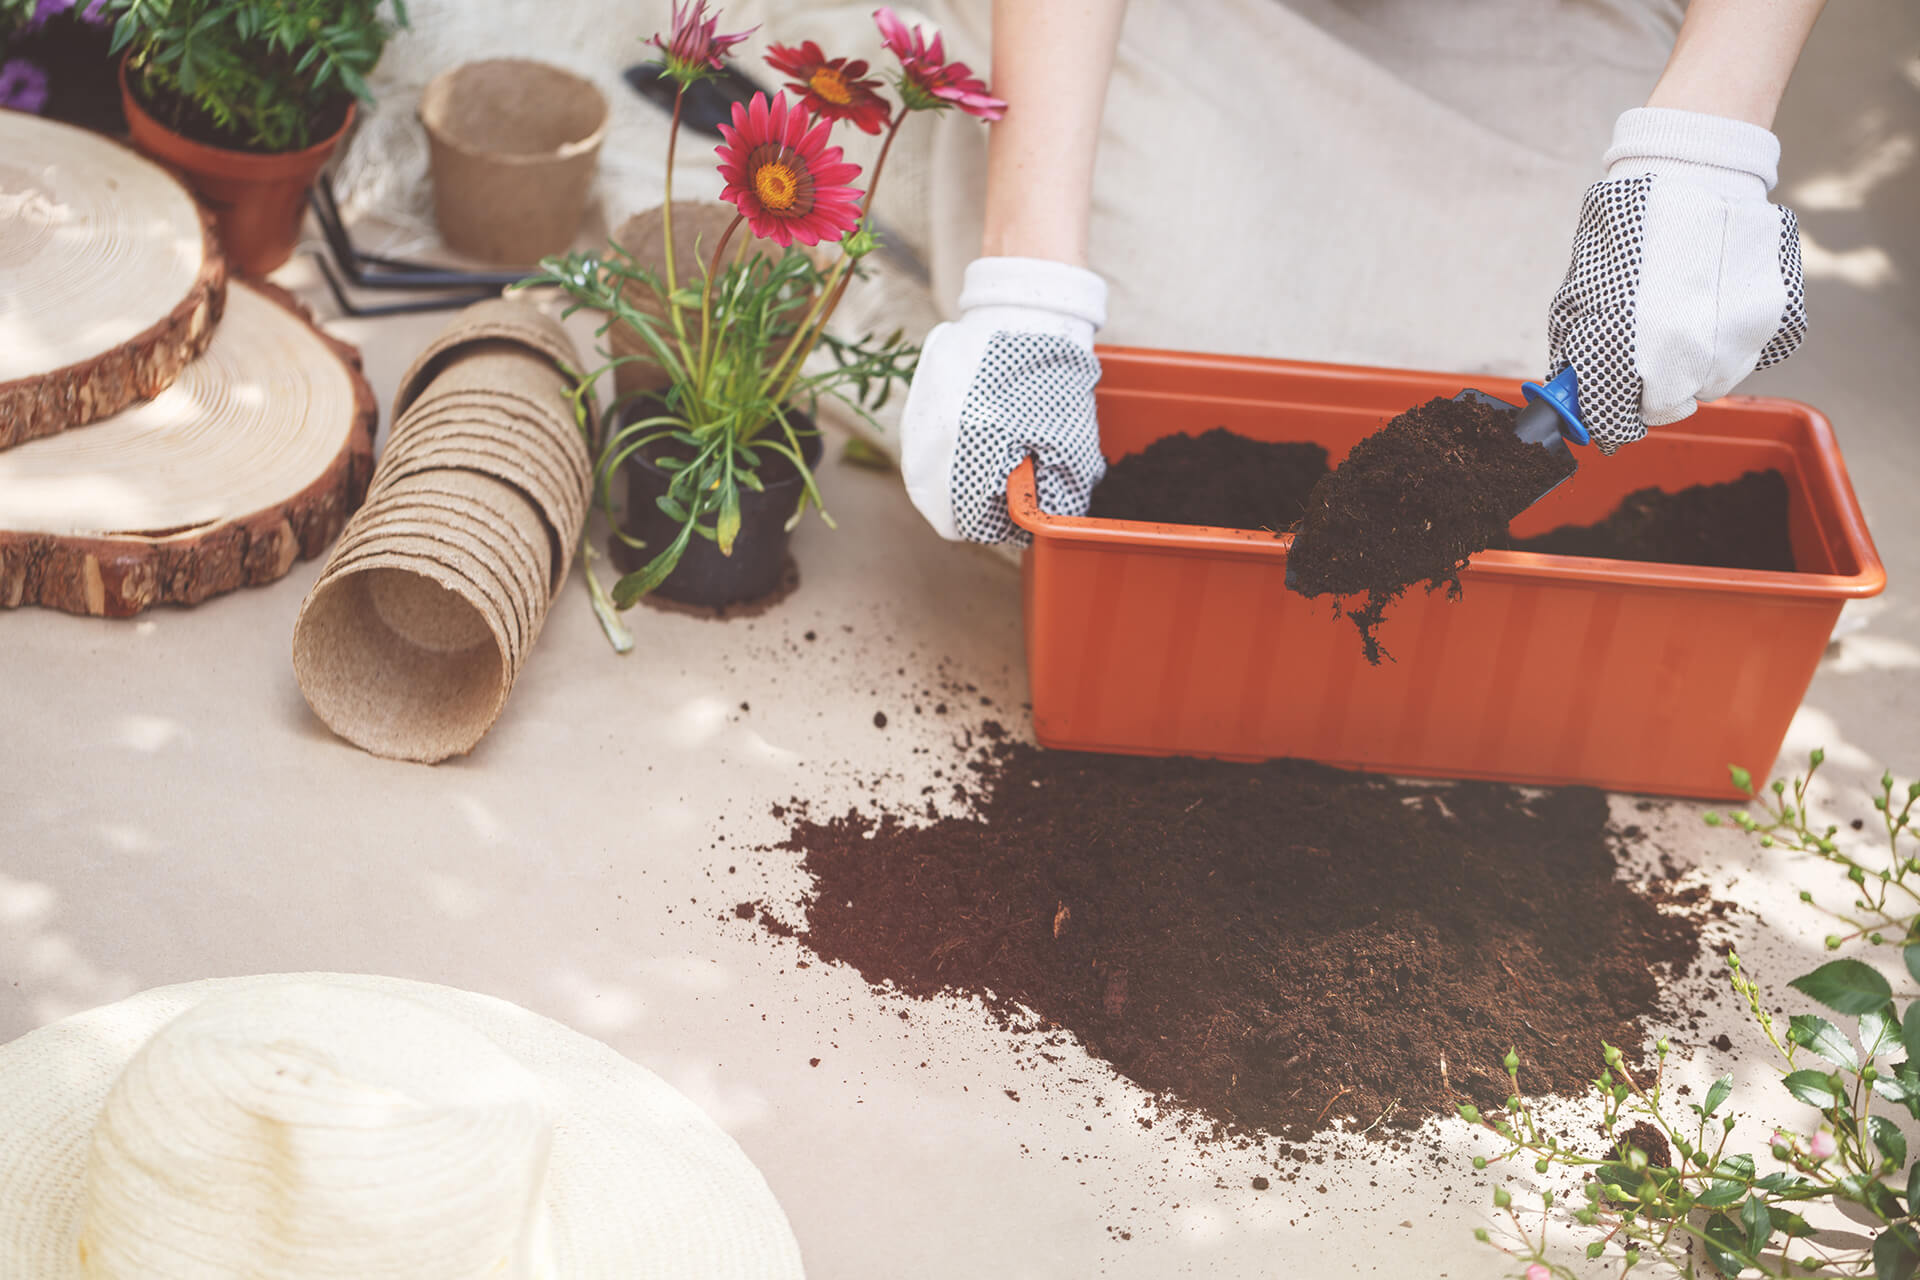 person-fertilizing-soil-in-container-P2BPT4E-1.jpg